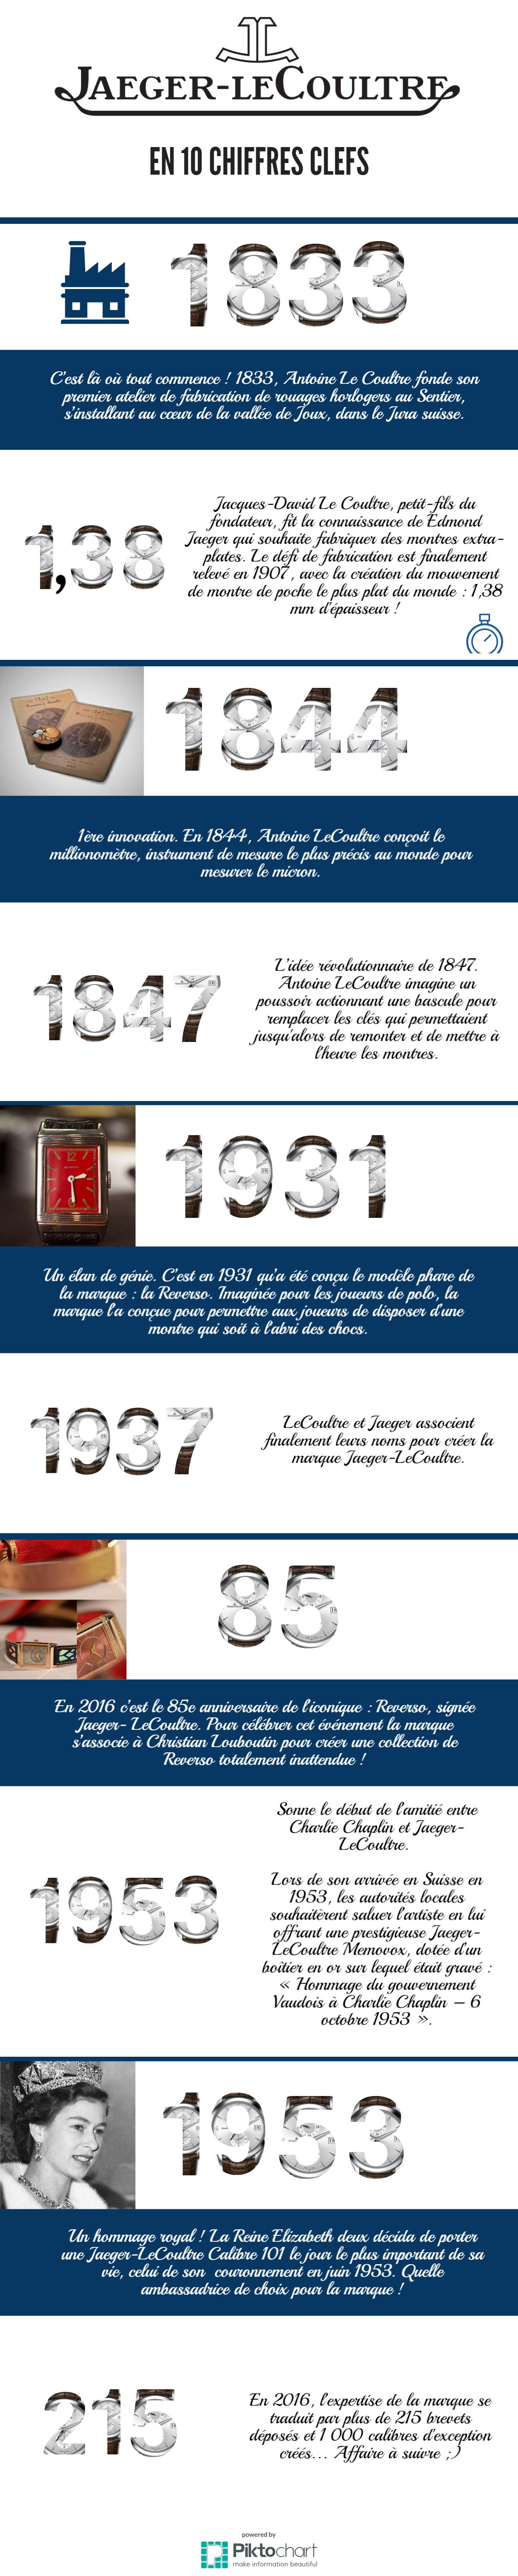 jaeger-le-coultre-infographie